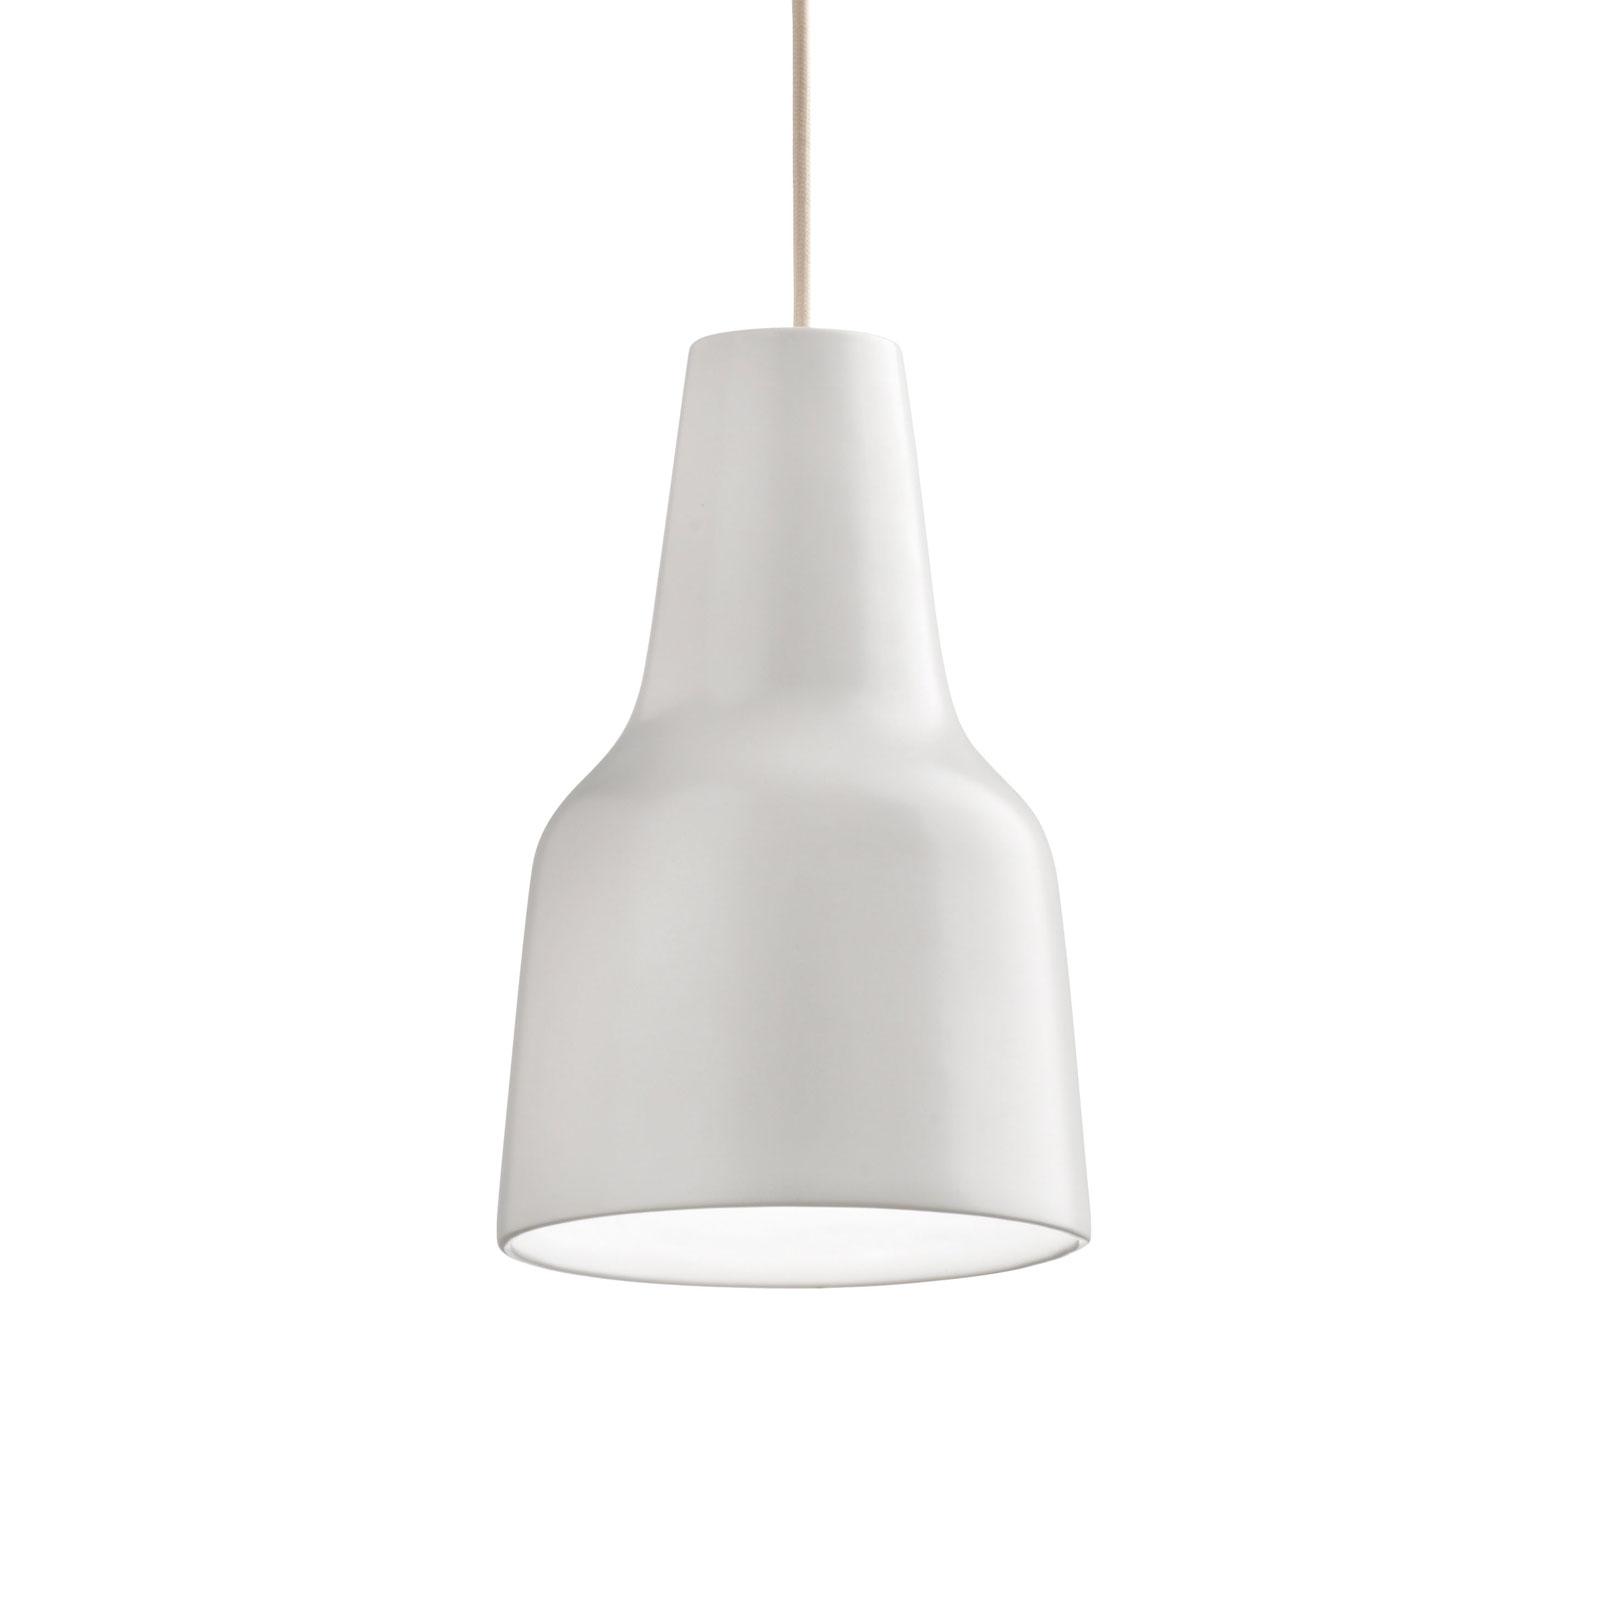 Modo Luce Eva suspension Ø 27cm blanche